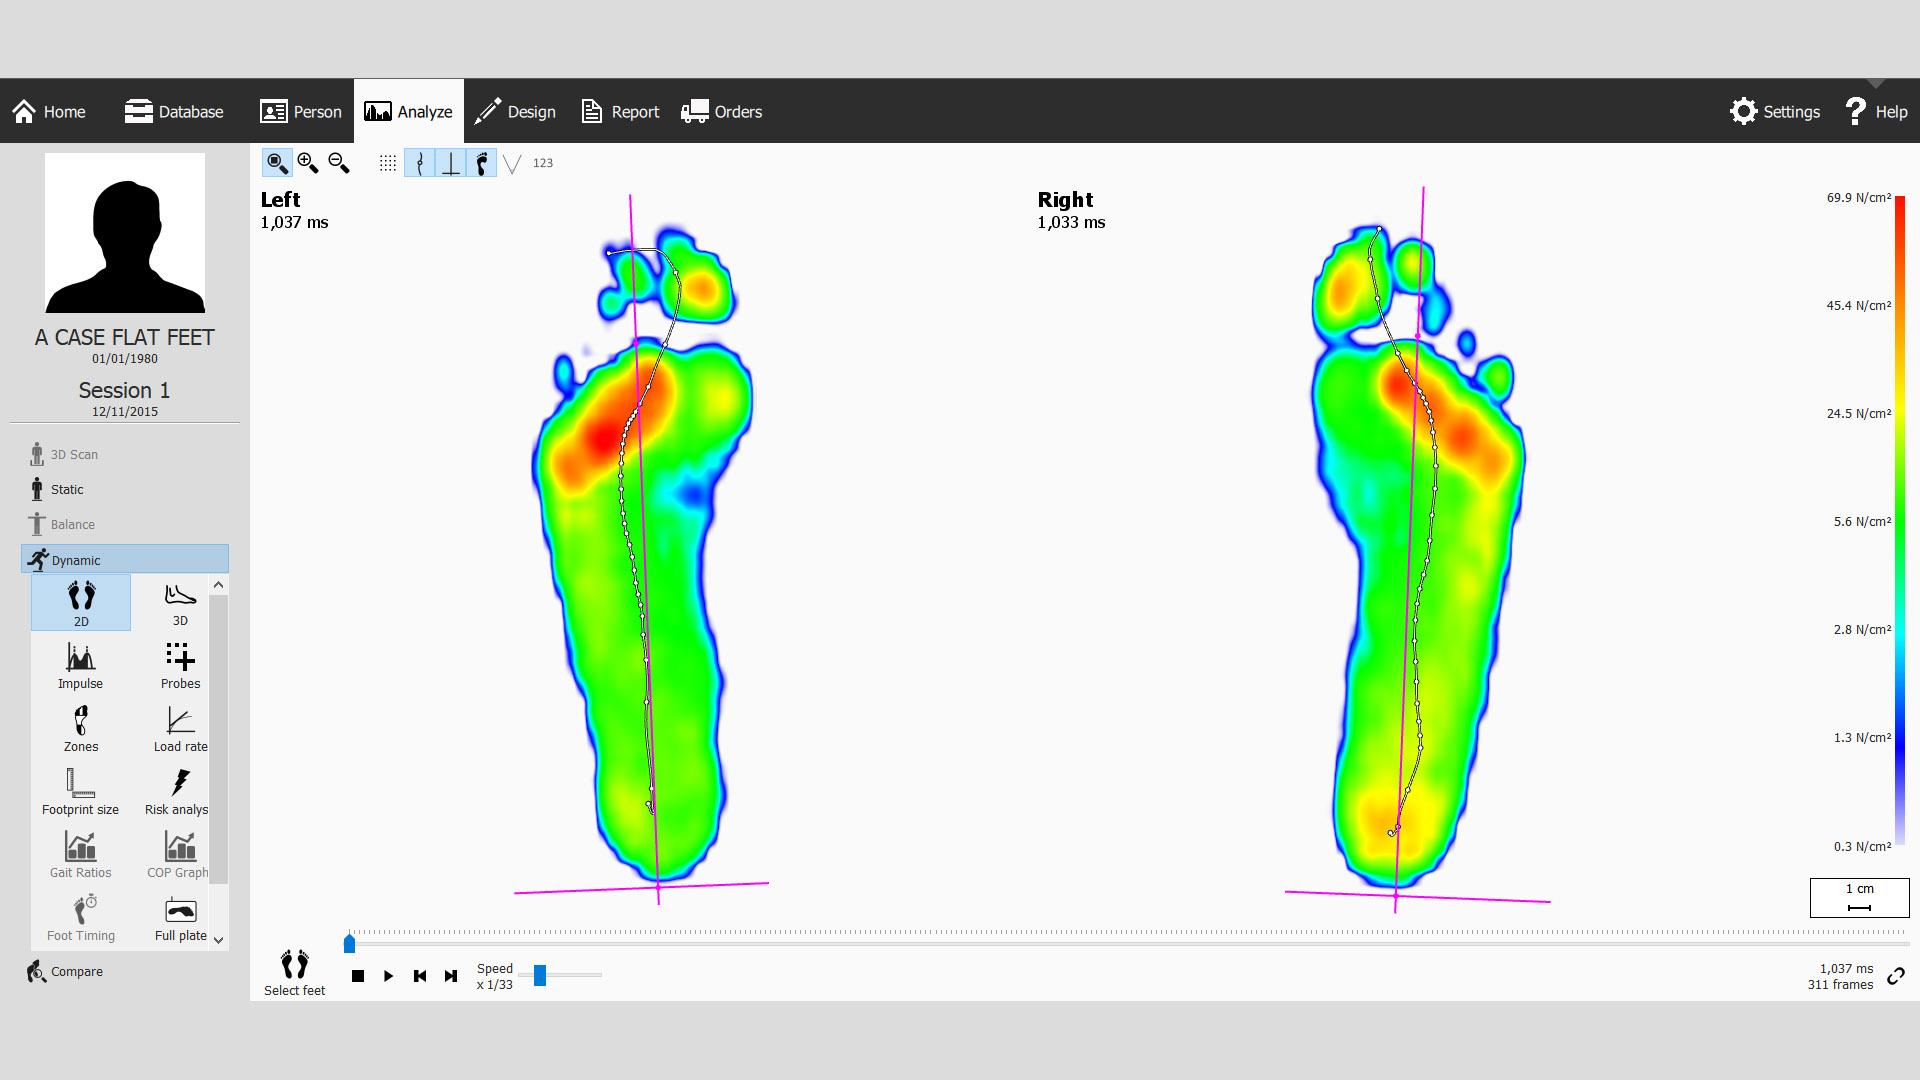 Gait Analysis for Flat Feet